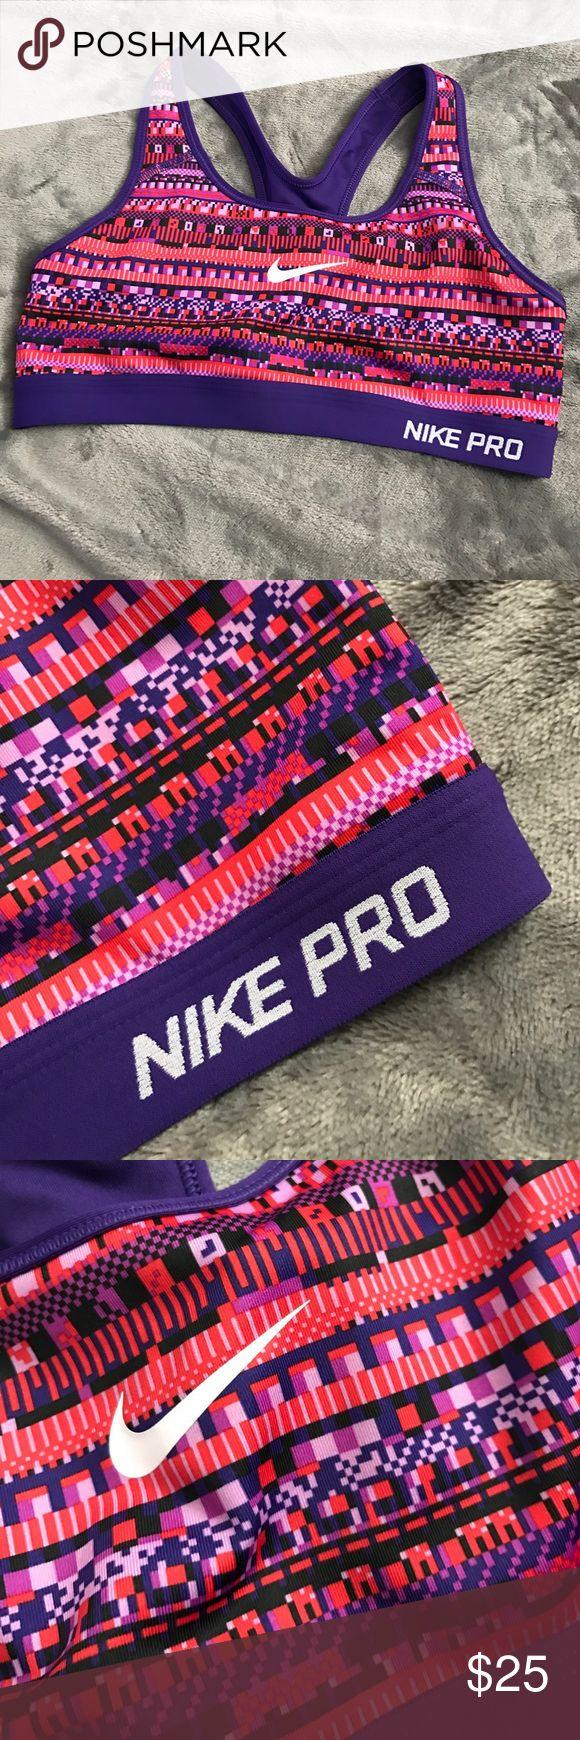 Nike Pro Dri-fit Sports Bra Nike Pro Dri-fit Aztec print sports bra. Size medium. Never worn.. too small for my boobs! 😂 perfect condition and good fit. Nike Intimates & Sleepwear Bras